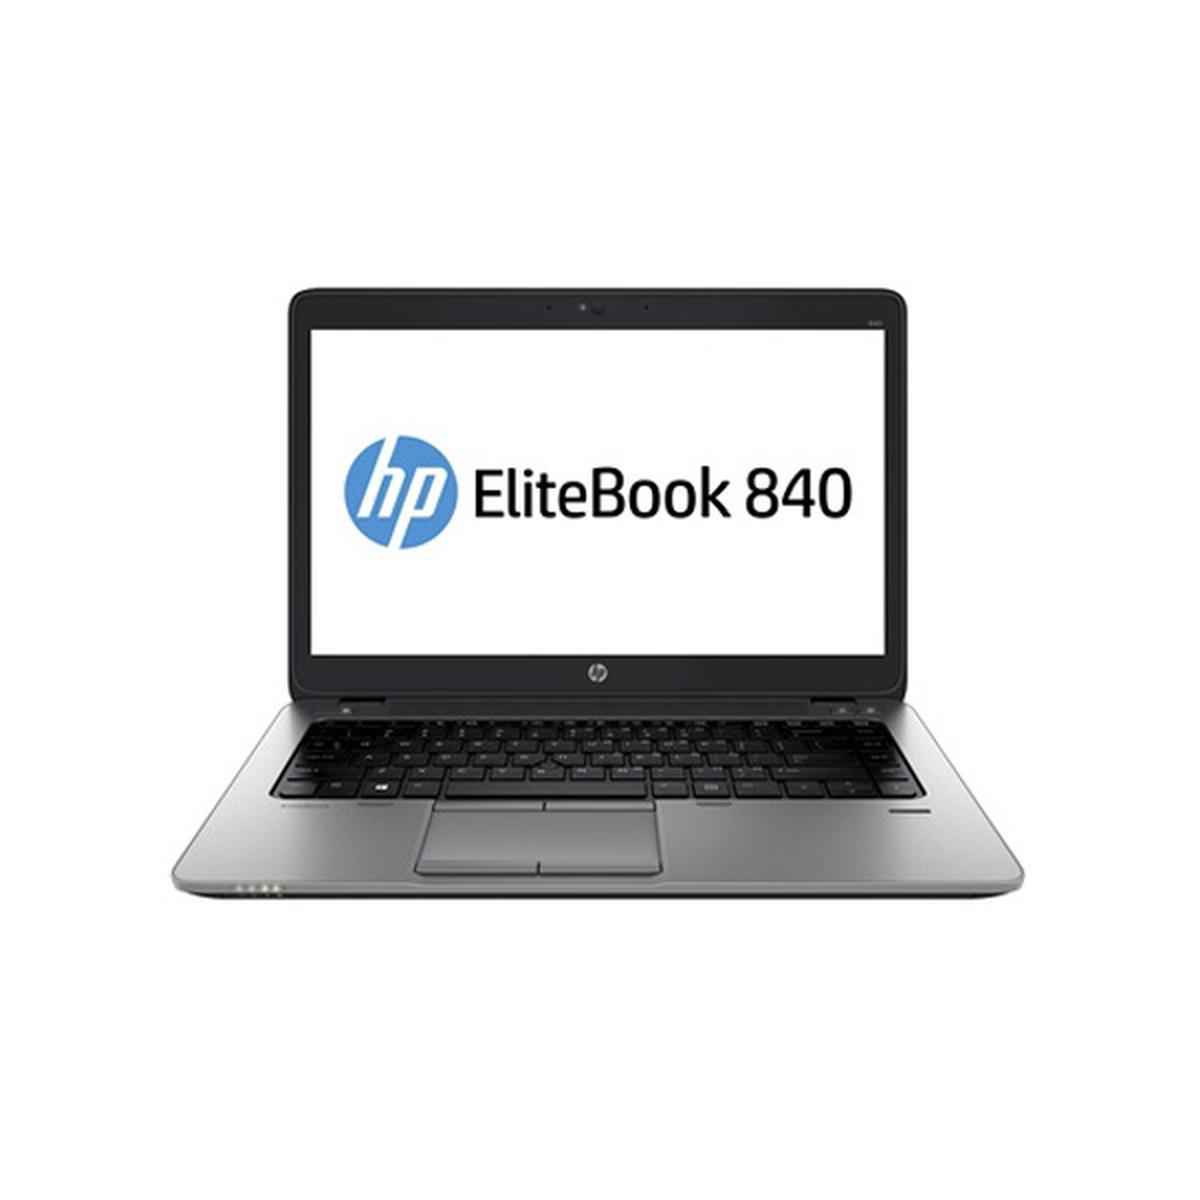 Hp EliteBook 840 G1 14-inch (2013) - Core i5-4300U - 8GB - SSD 180 GB QWERTY - Spanish